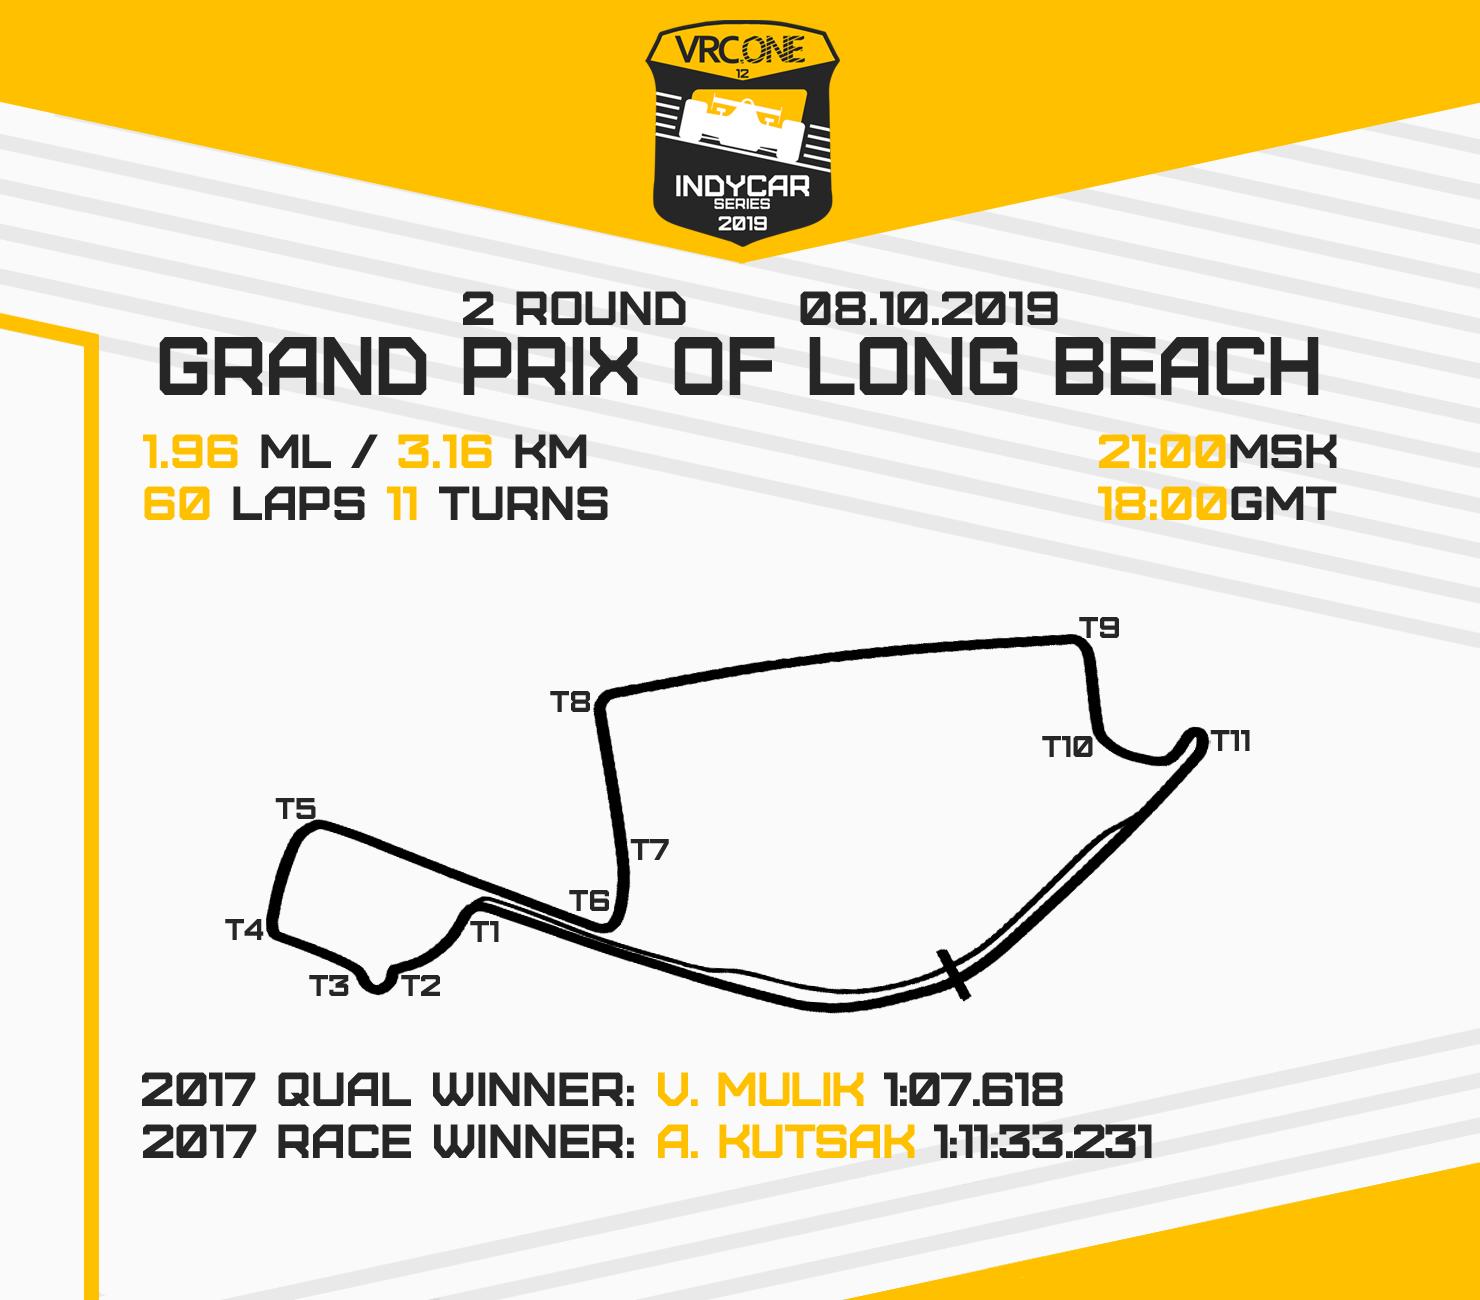 VRC Indycar 2019 - Round 2 - Long Beach